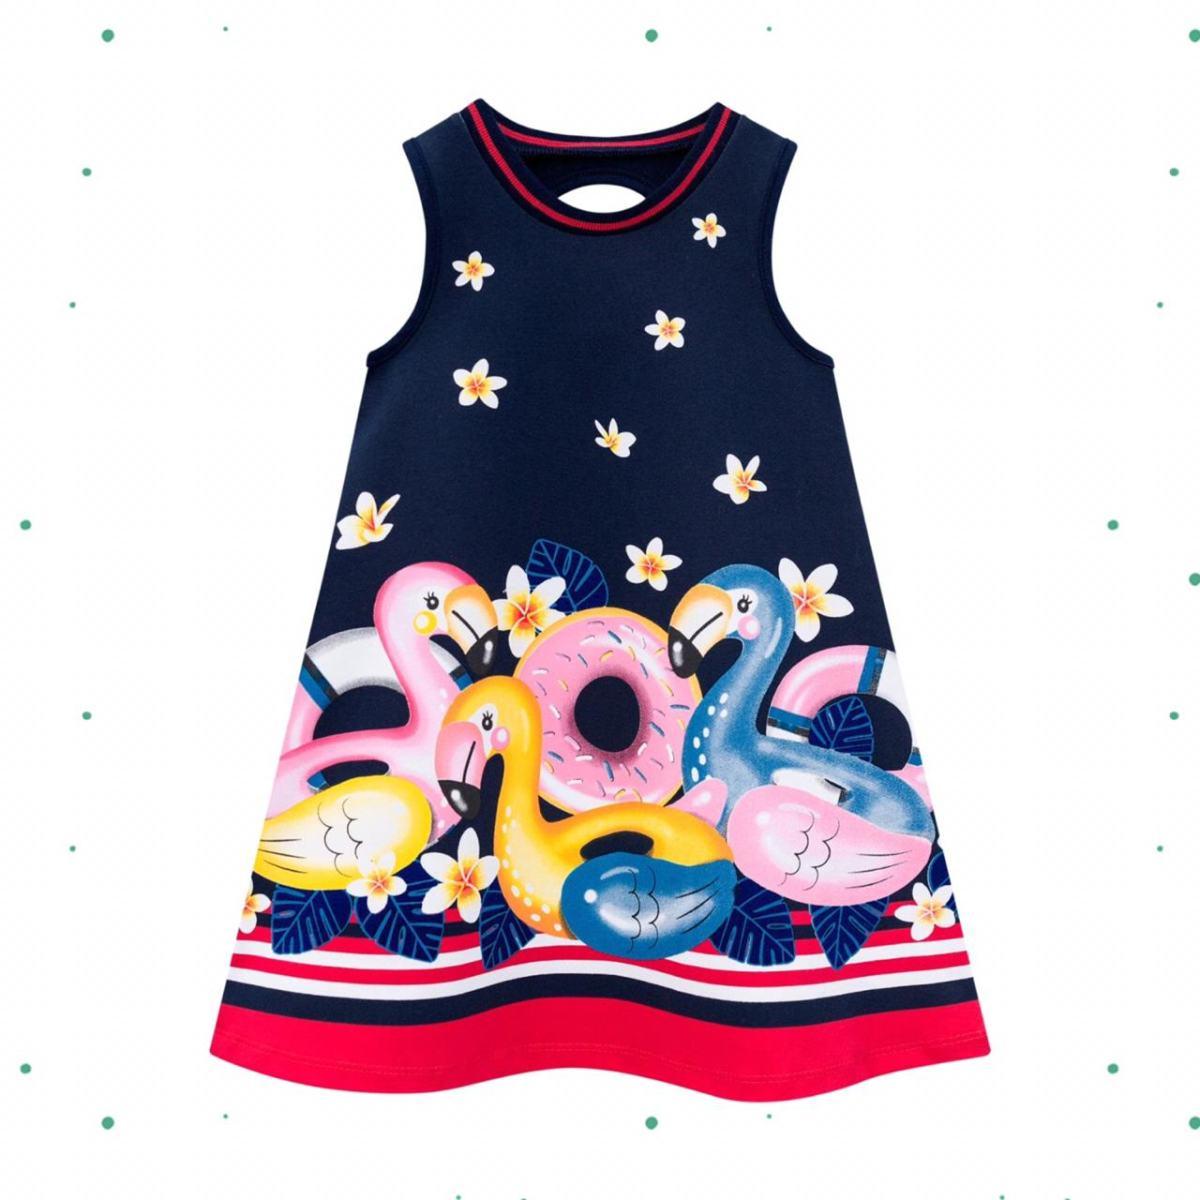 Vestido Infantil Kyly em Cotton na cor Marinho